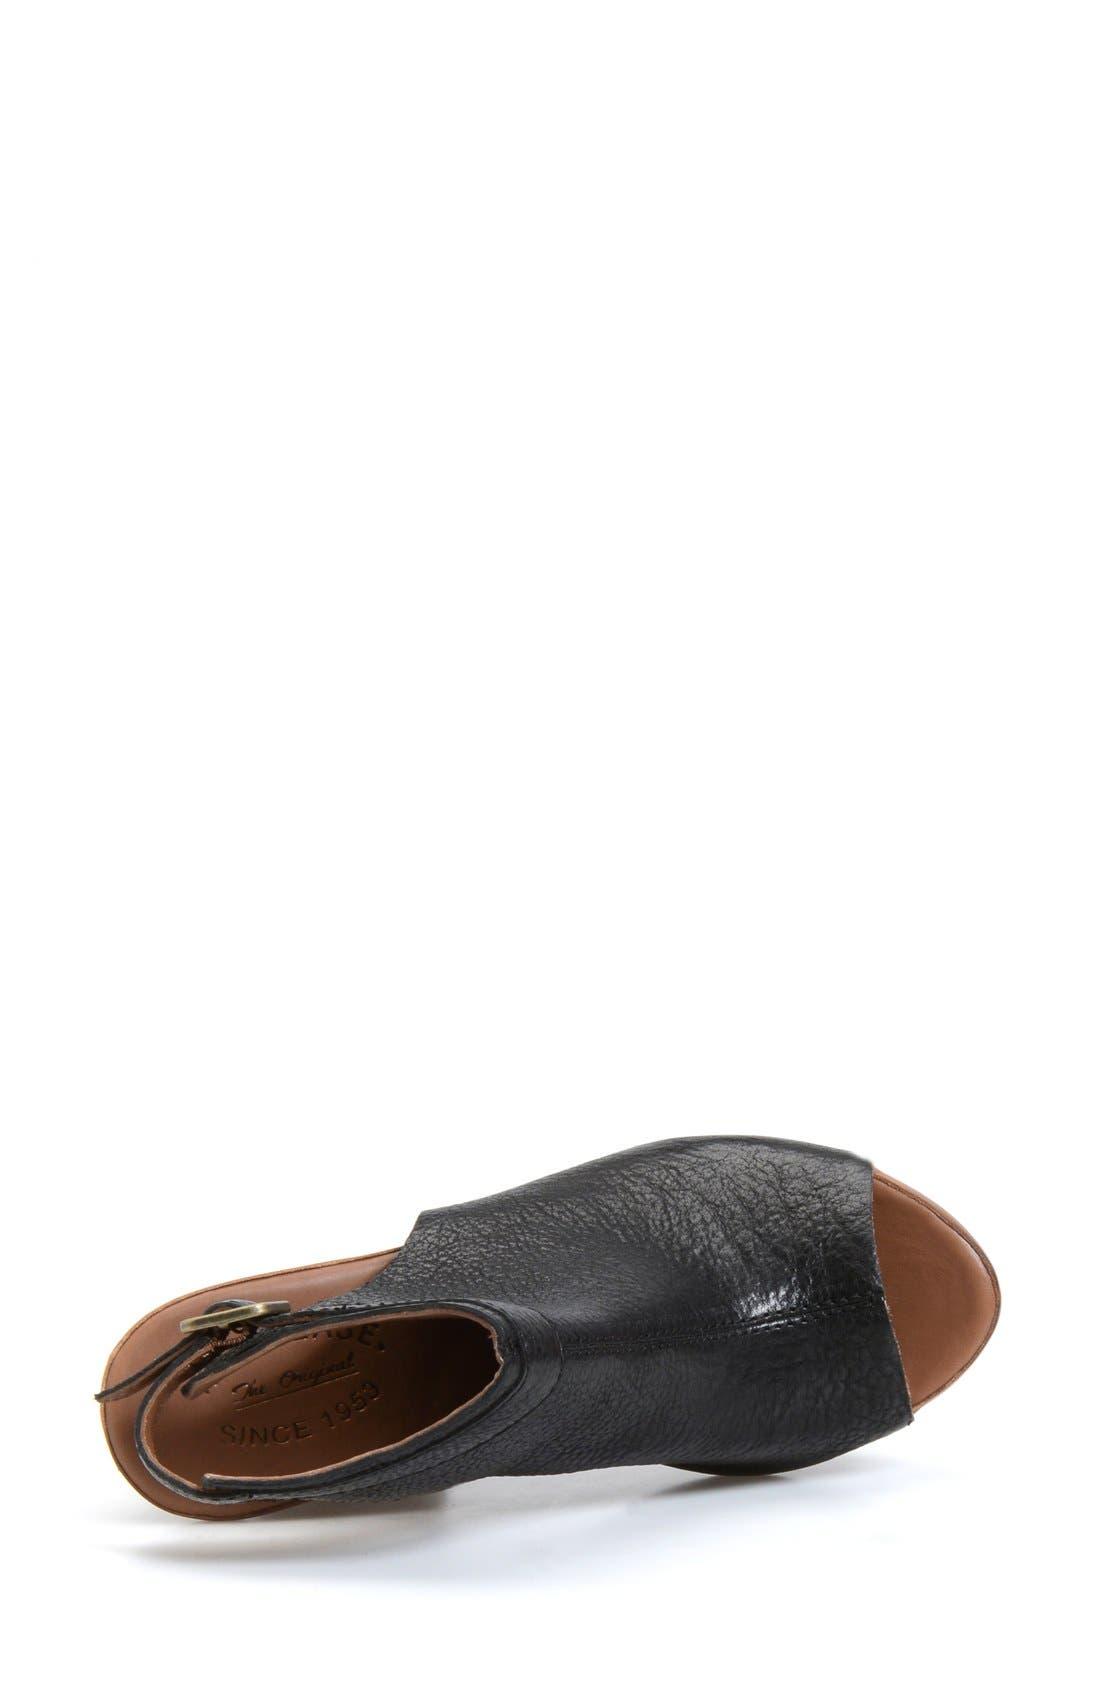 'Berit' Wedge Sandal,                             Alternate thumbnail 53, color,